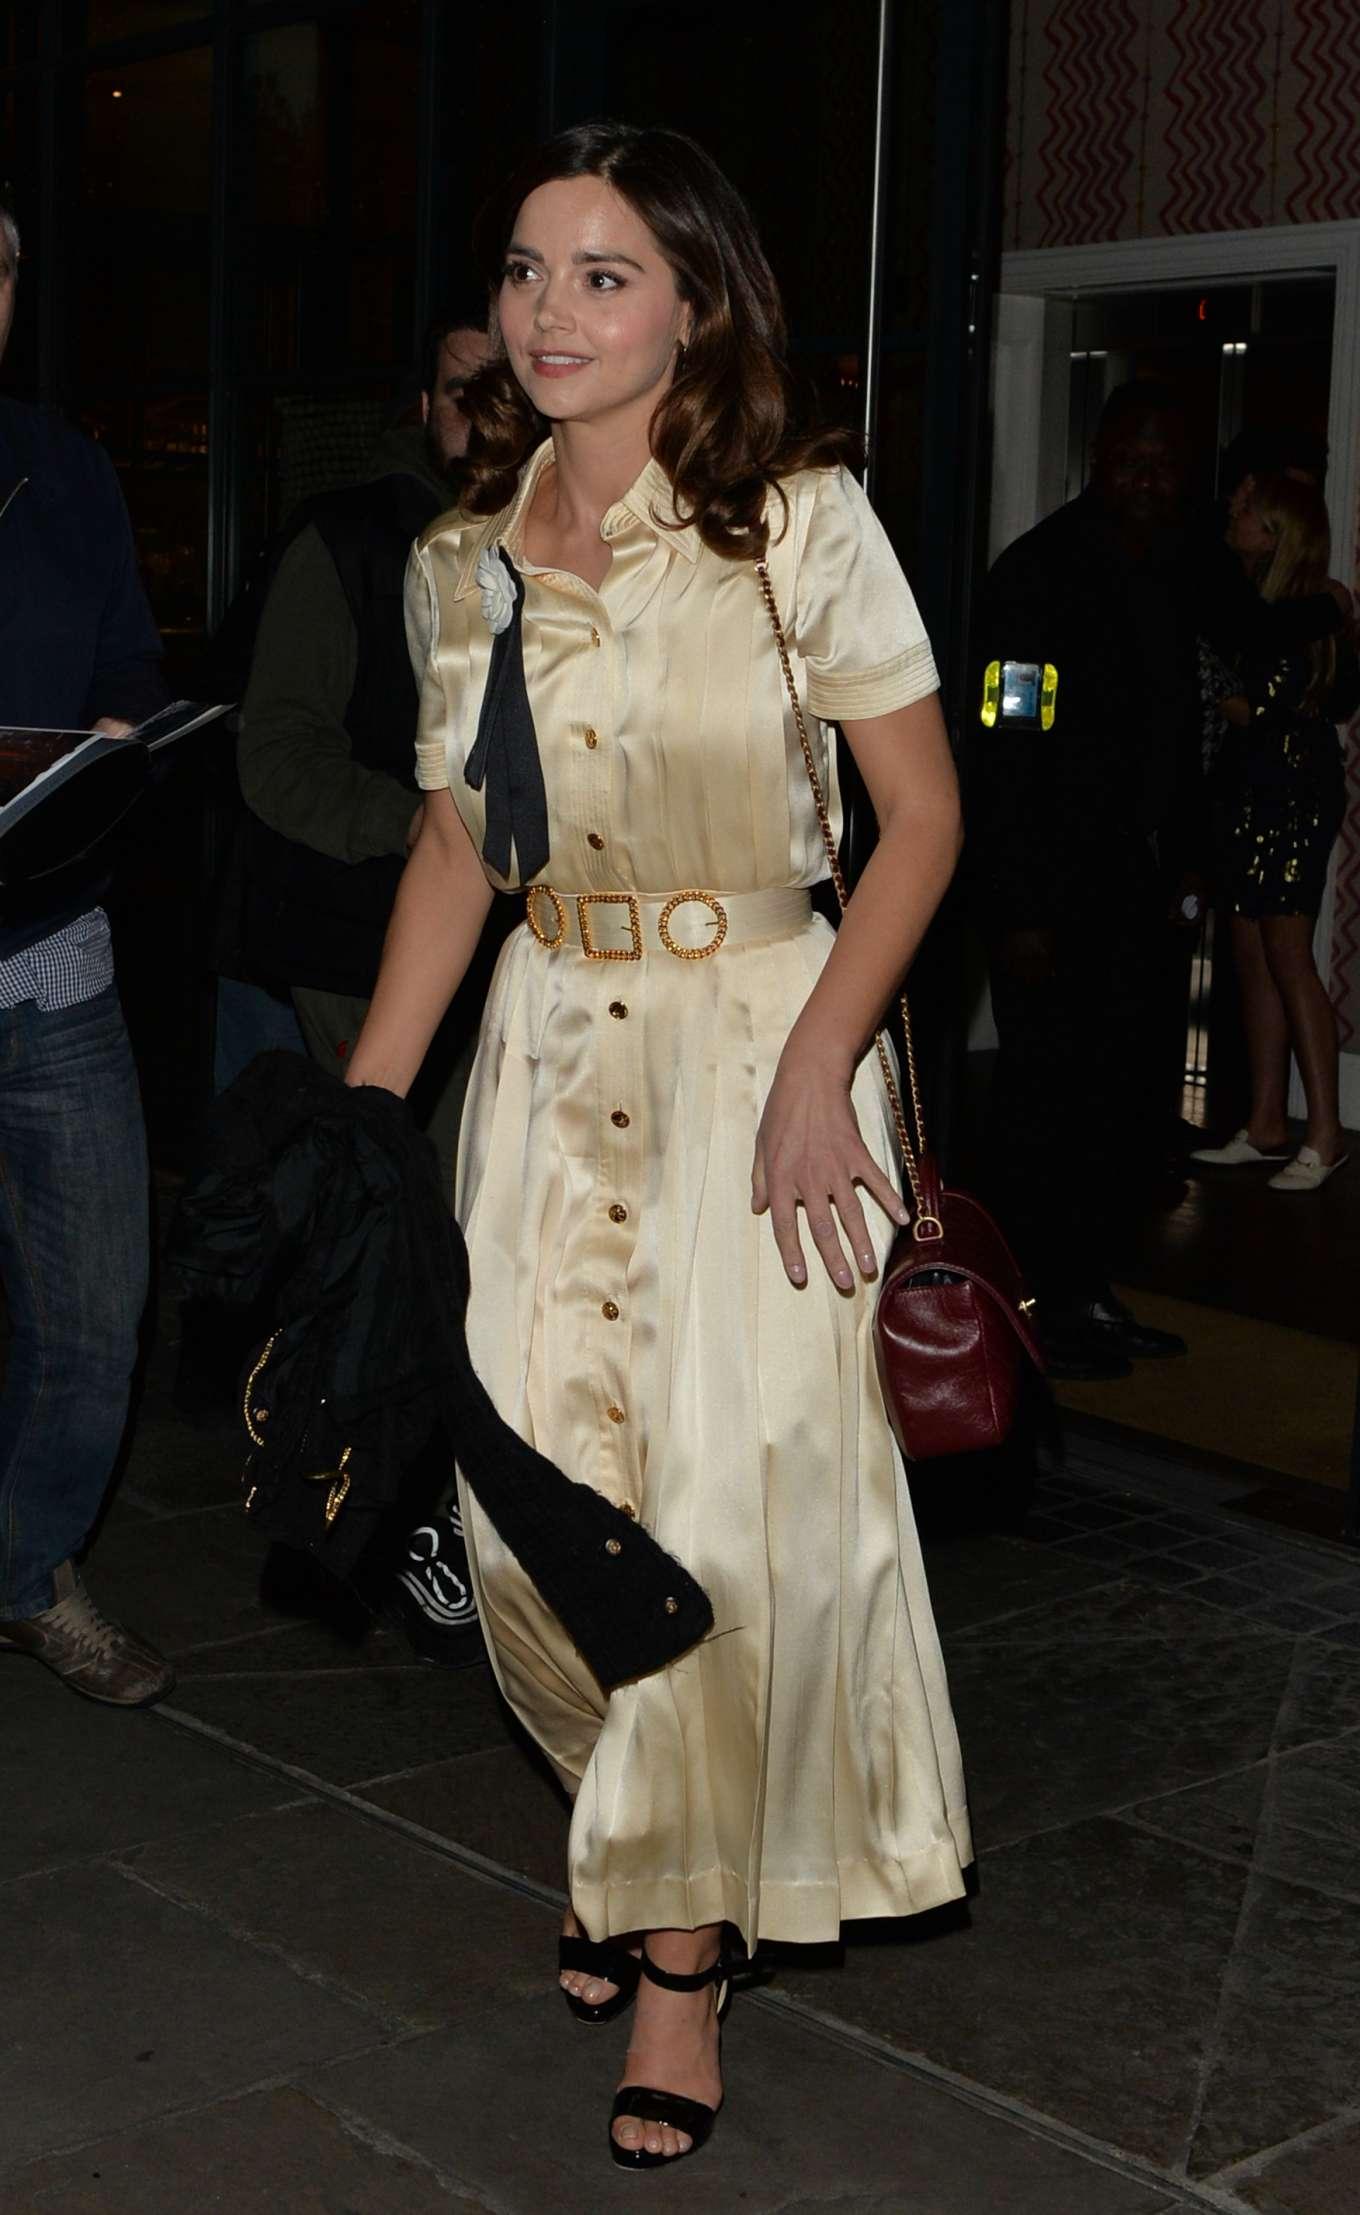 Jenna Coleman - Leaving Ham Yard Hotel in Soho in London